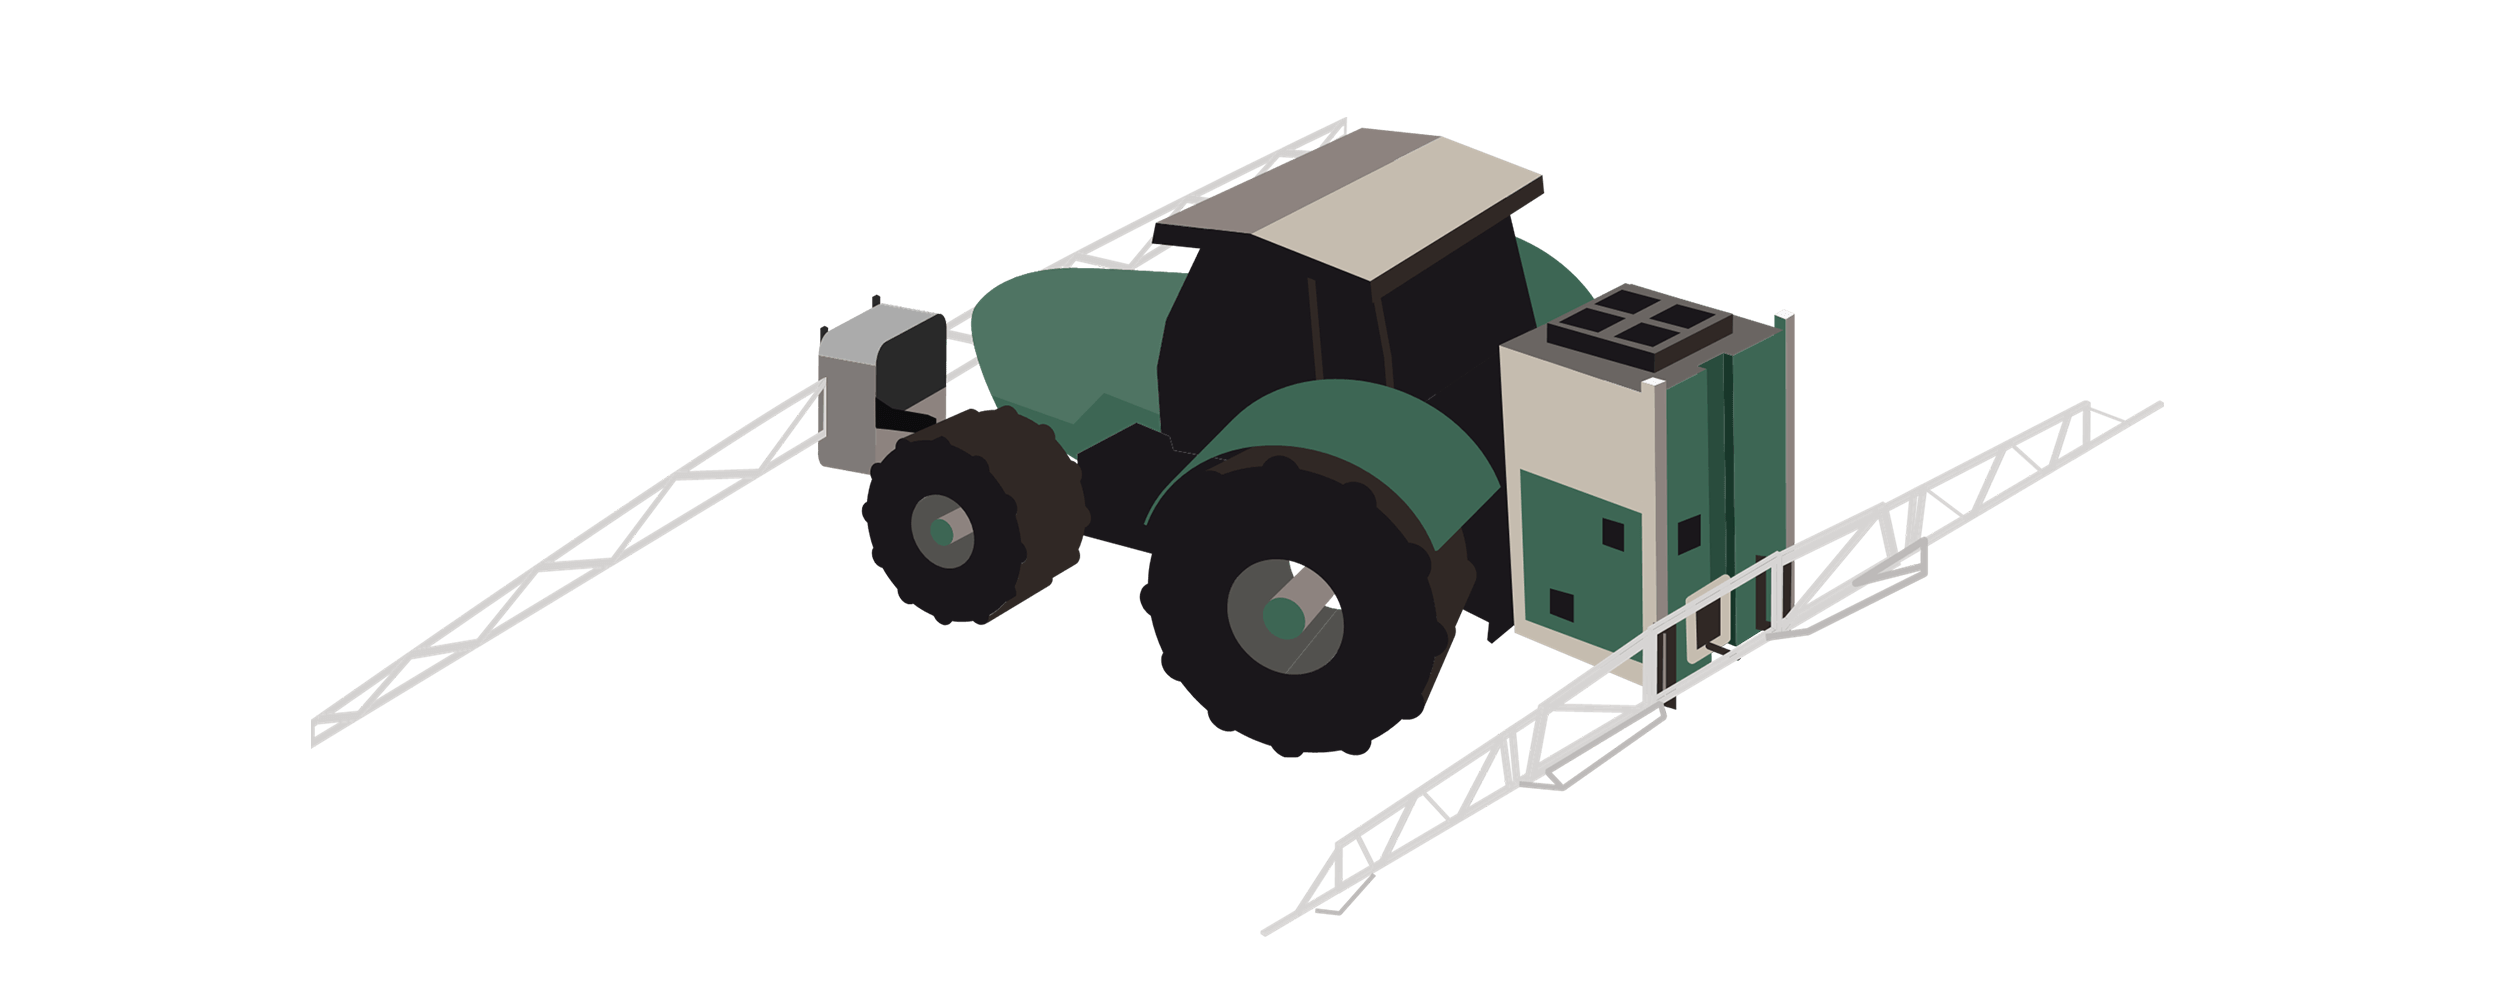 NUCROP_Tractor_Illustration